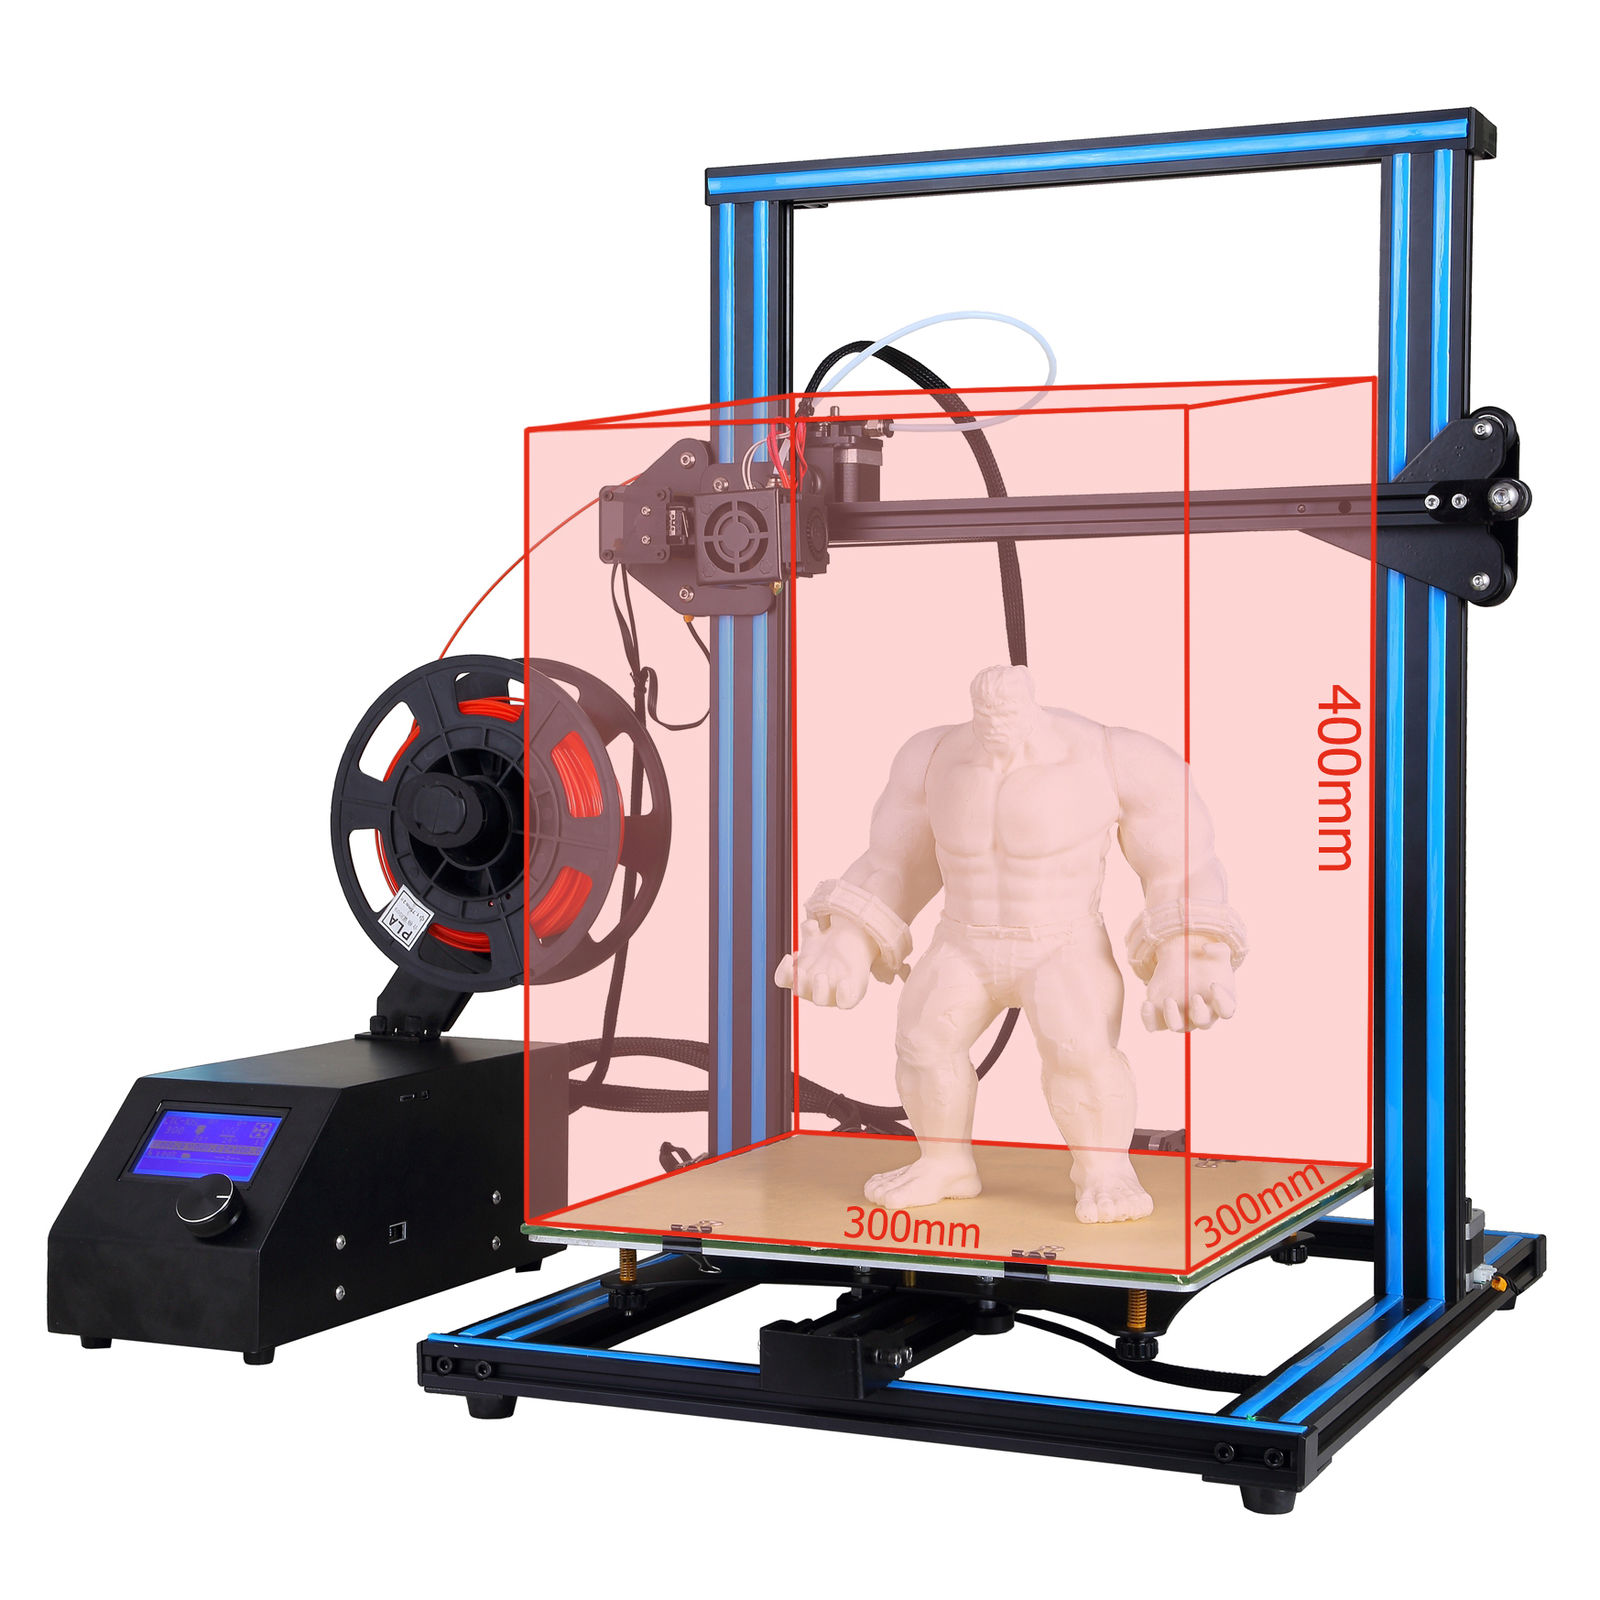 A-10S 3D Drucker Dual Z-achse DIY Große Modelle 300*300*400mm drucker 3d Drucker Impressora imprimante